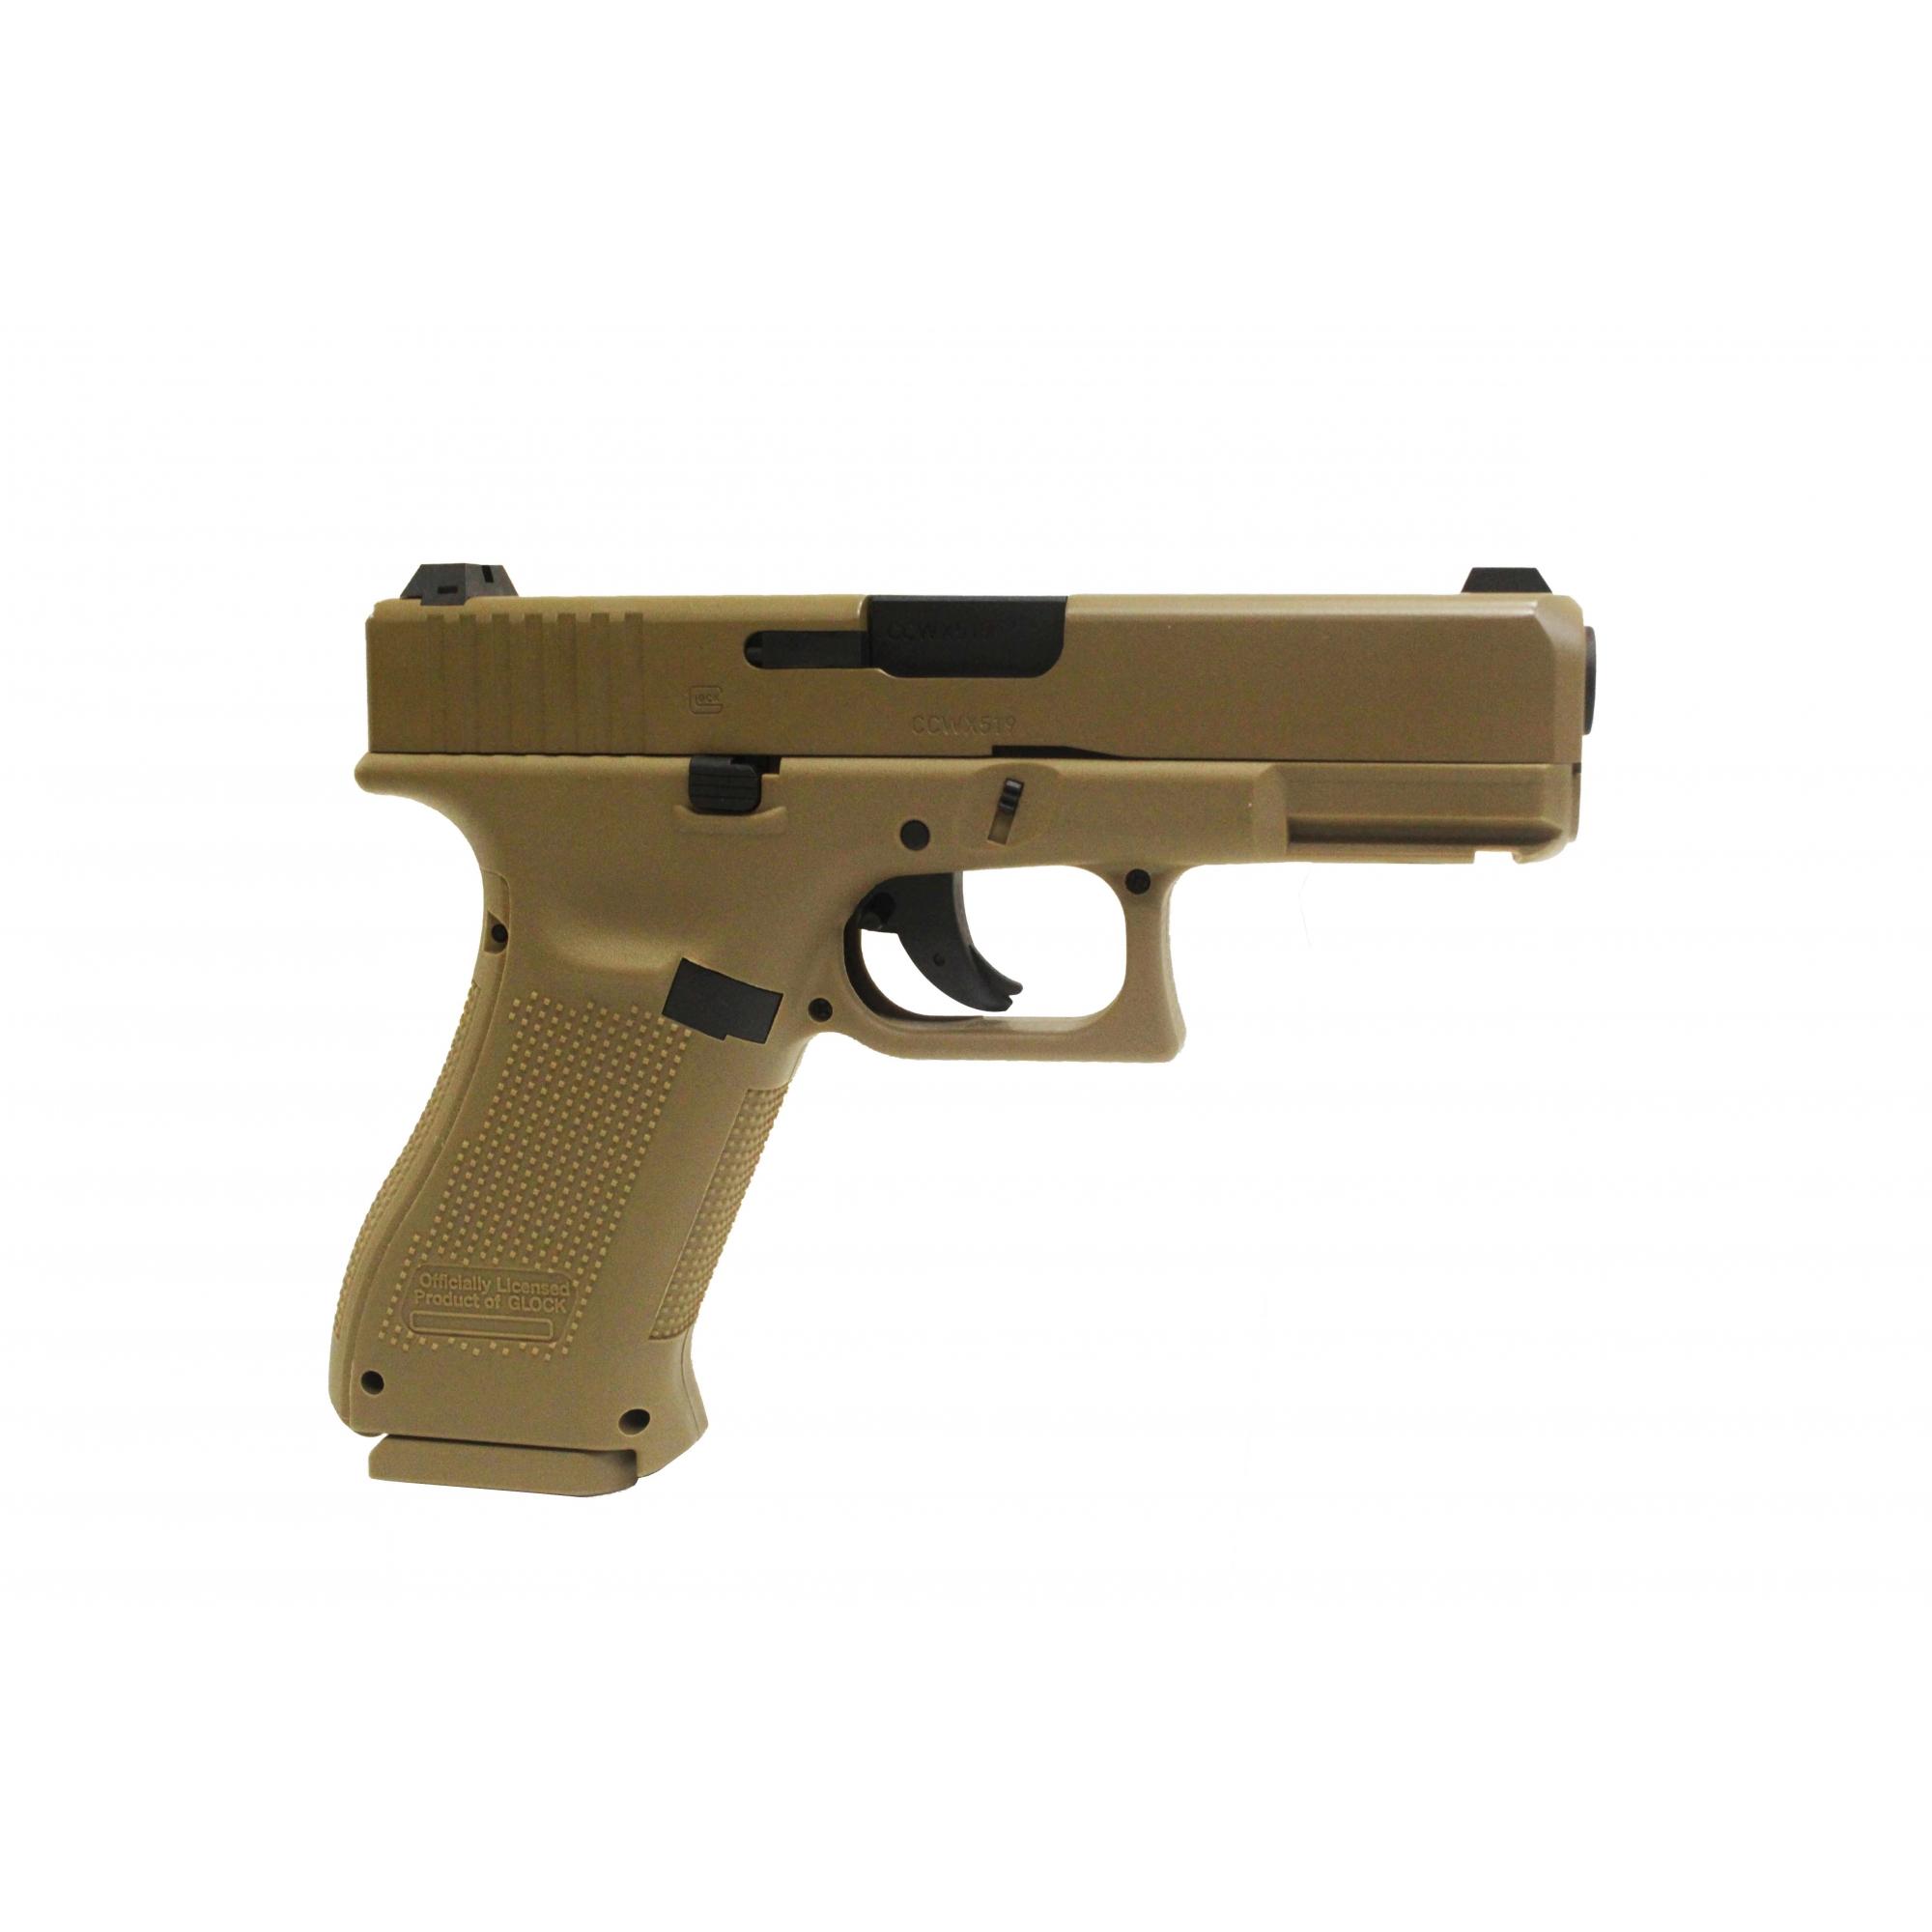 Pistola de Pressão Glock G19x Tan Co2 4.5mm